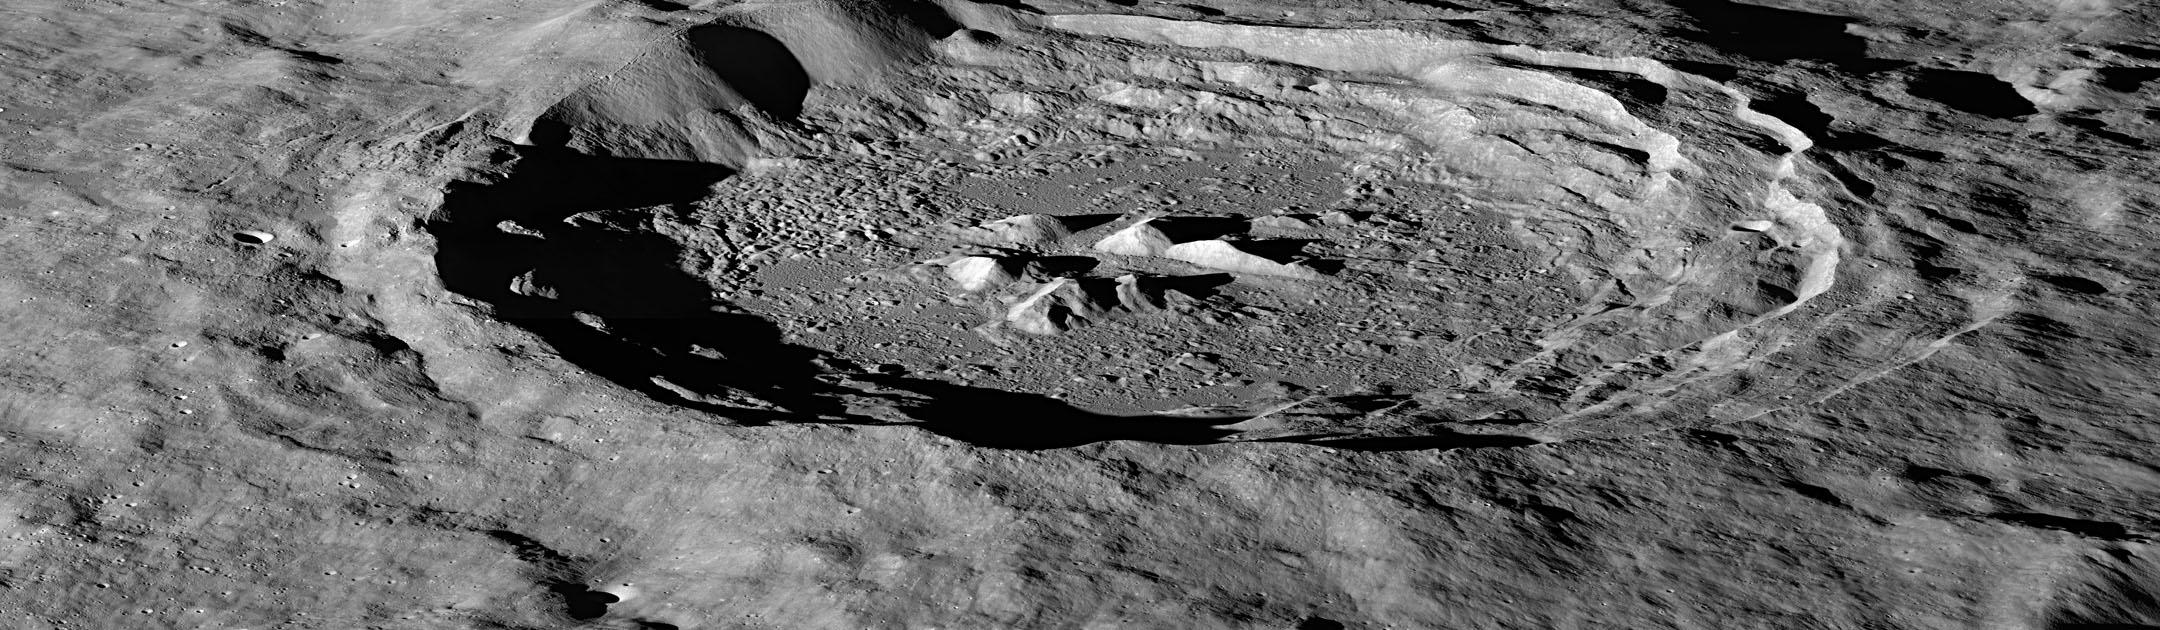 Moon Hayn crater